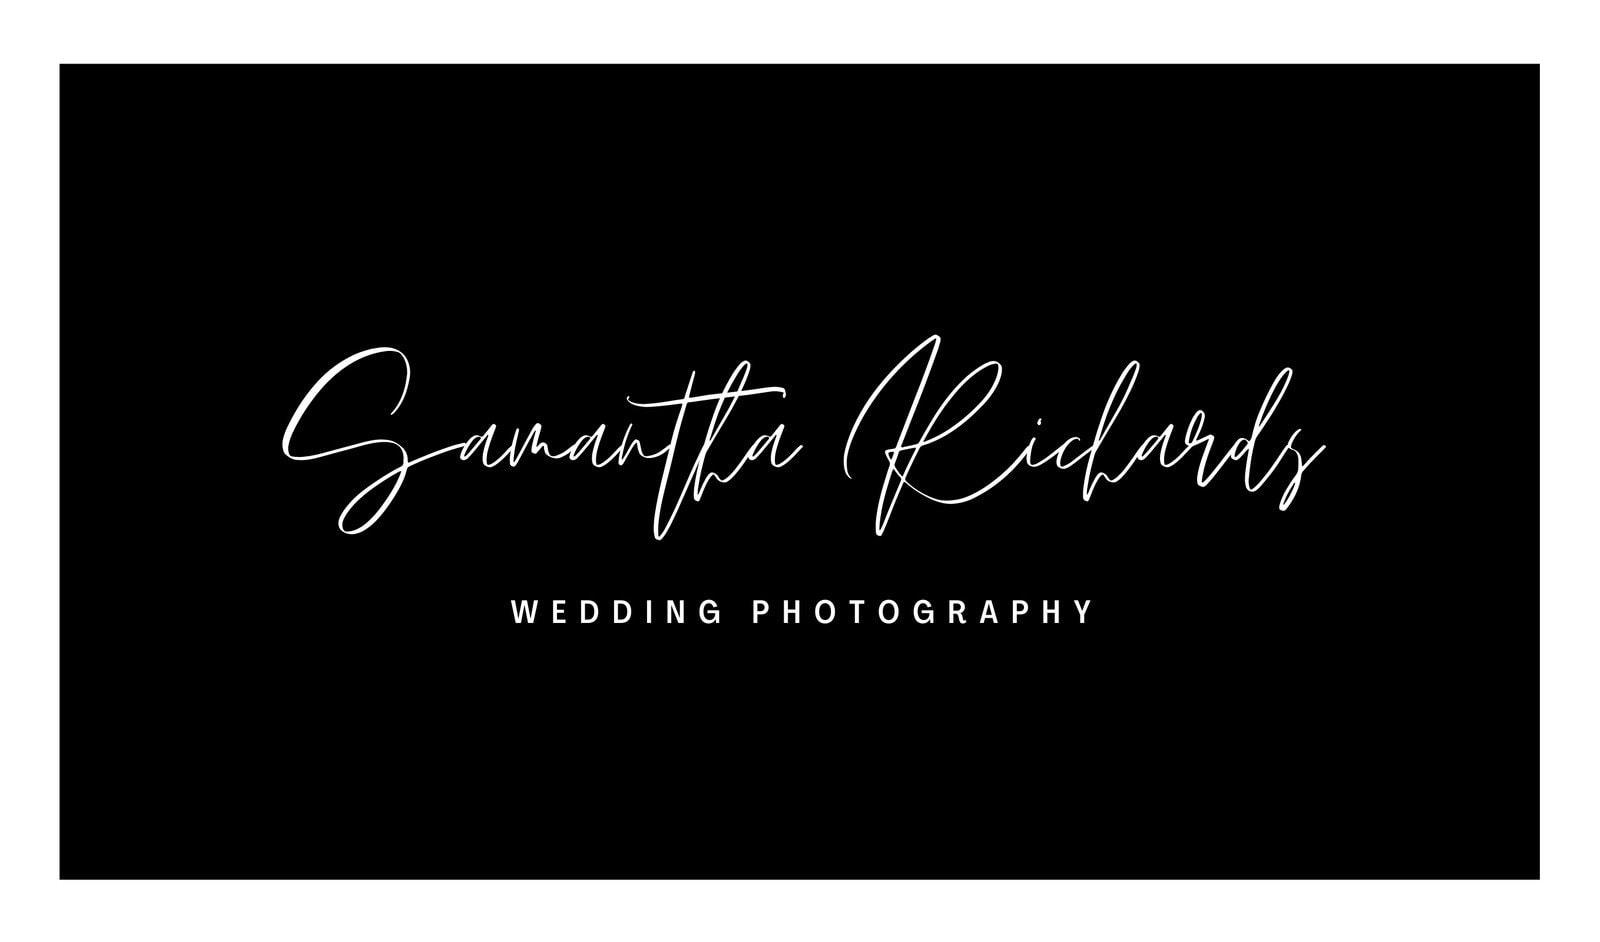 Black Wedding Photography Business Card